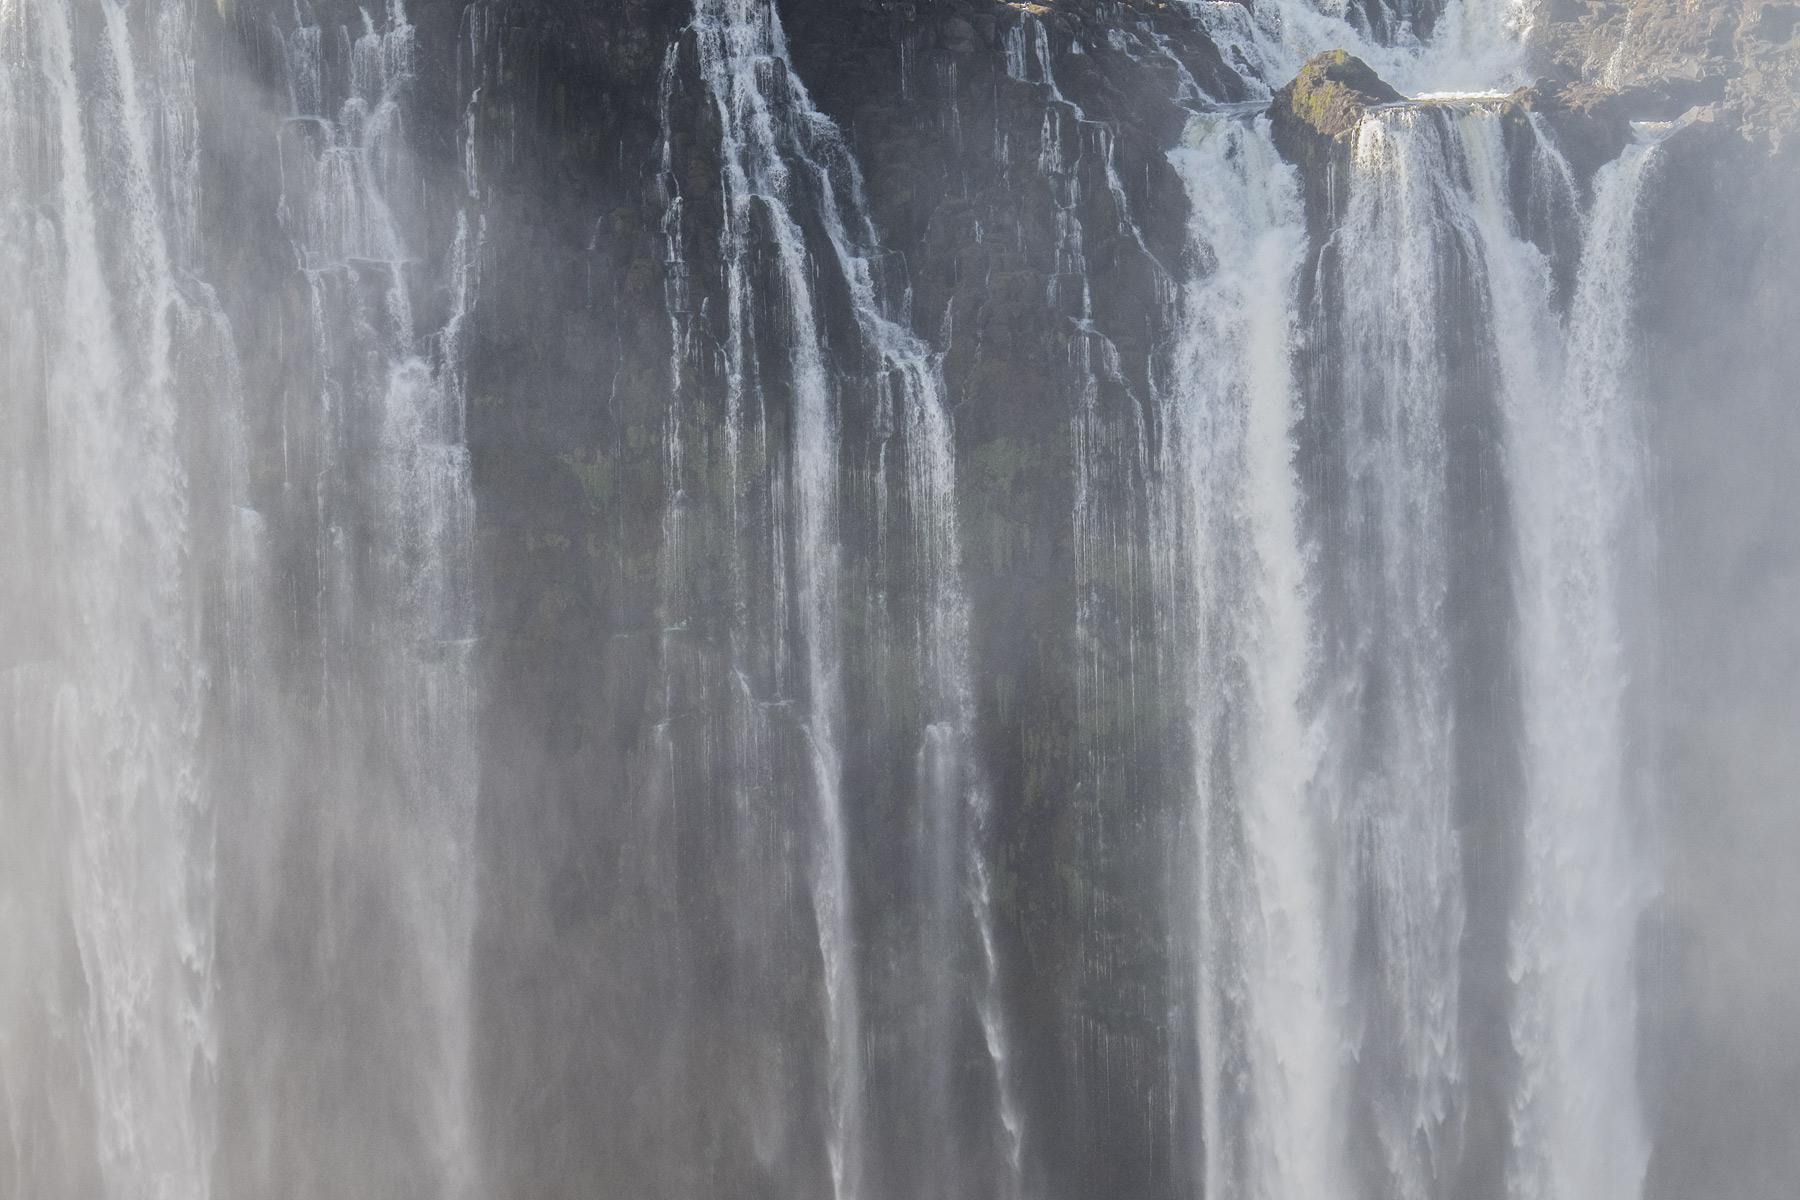 Eau De Curtain, Victoria Falls, Zimbabwe, Africa, seven wonders, Moasai a Tunya, spray, waterfall, gallons, water, Zambe, photo